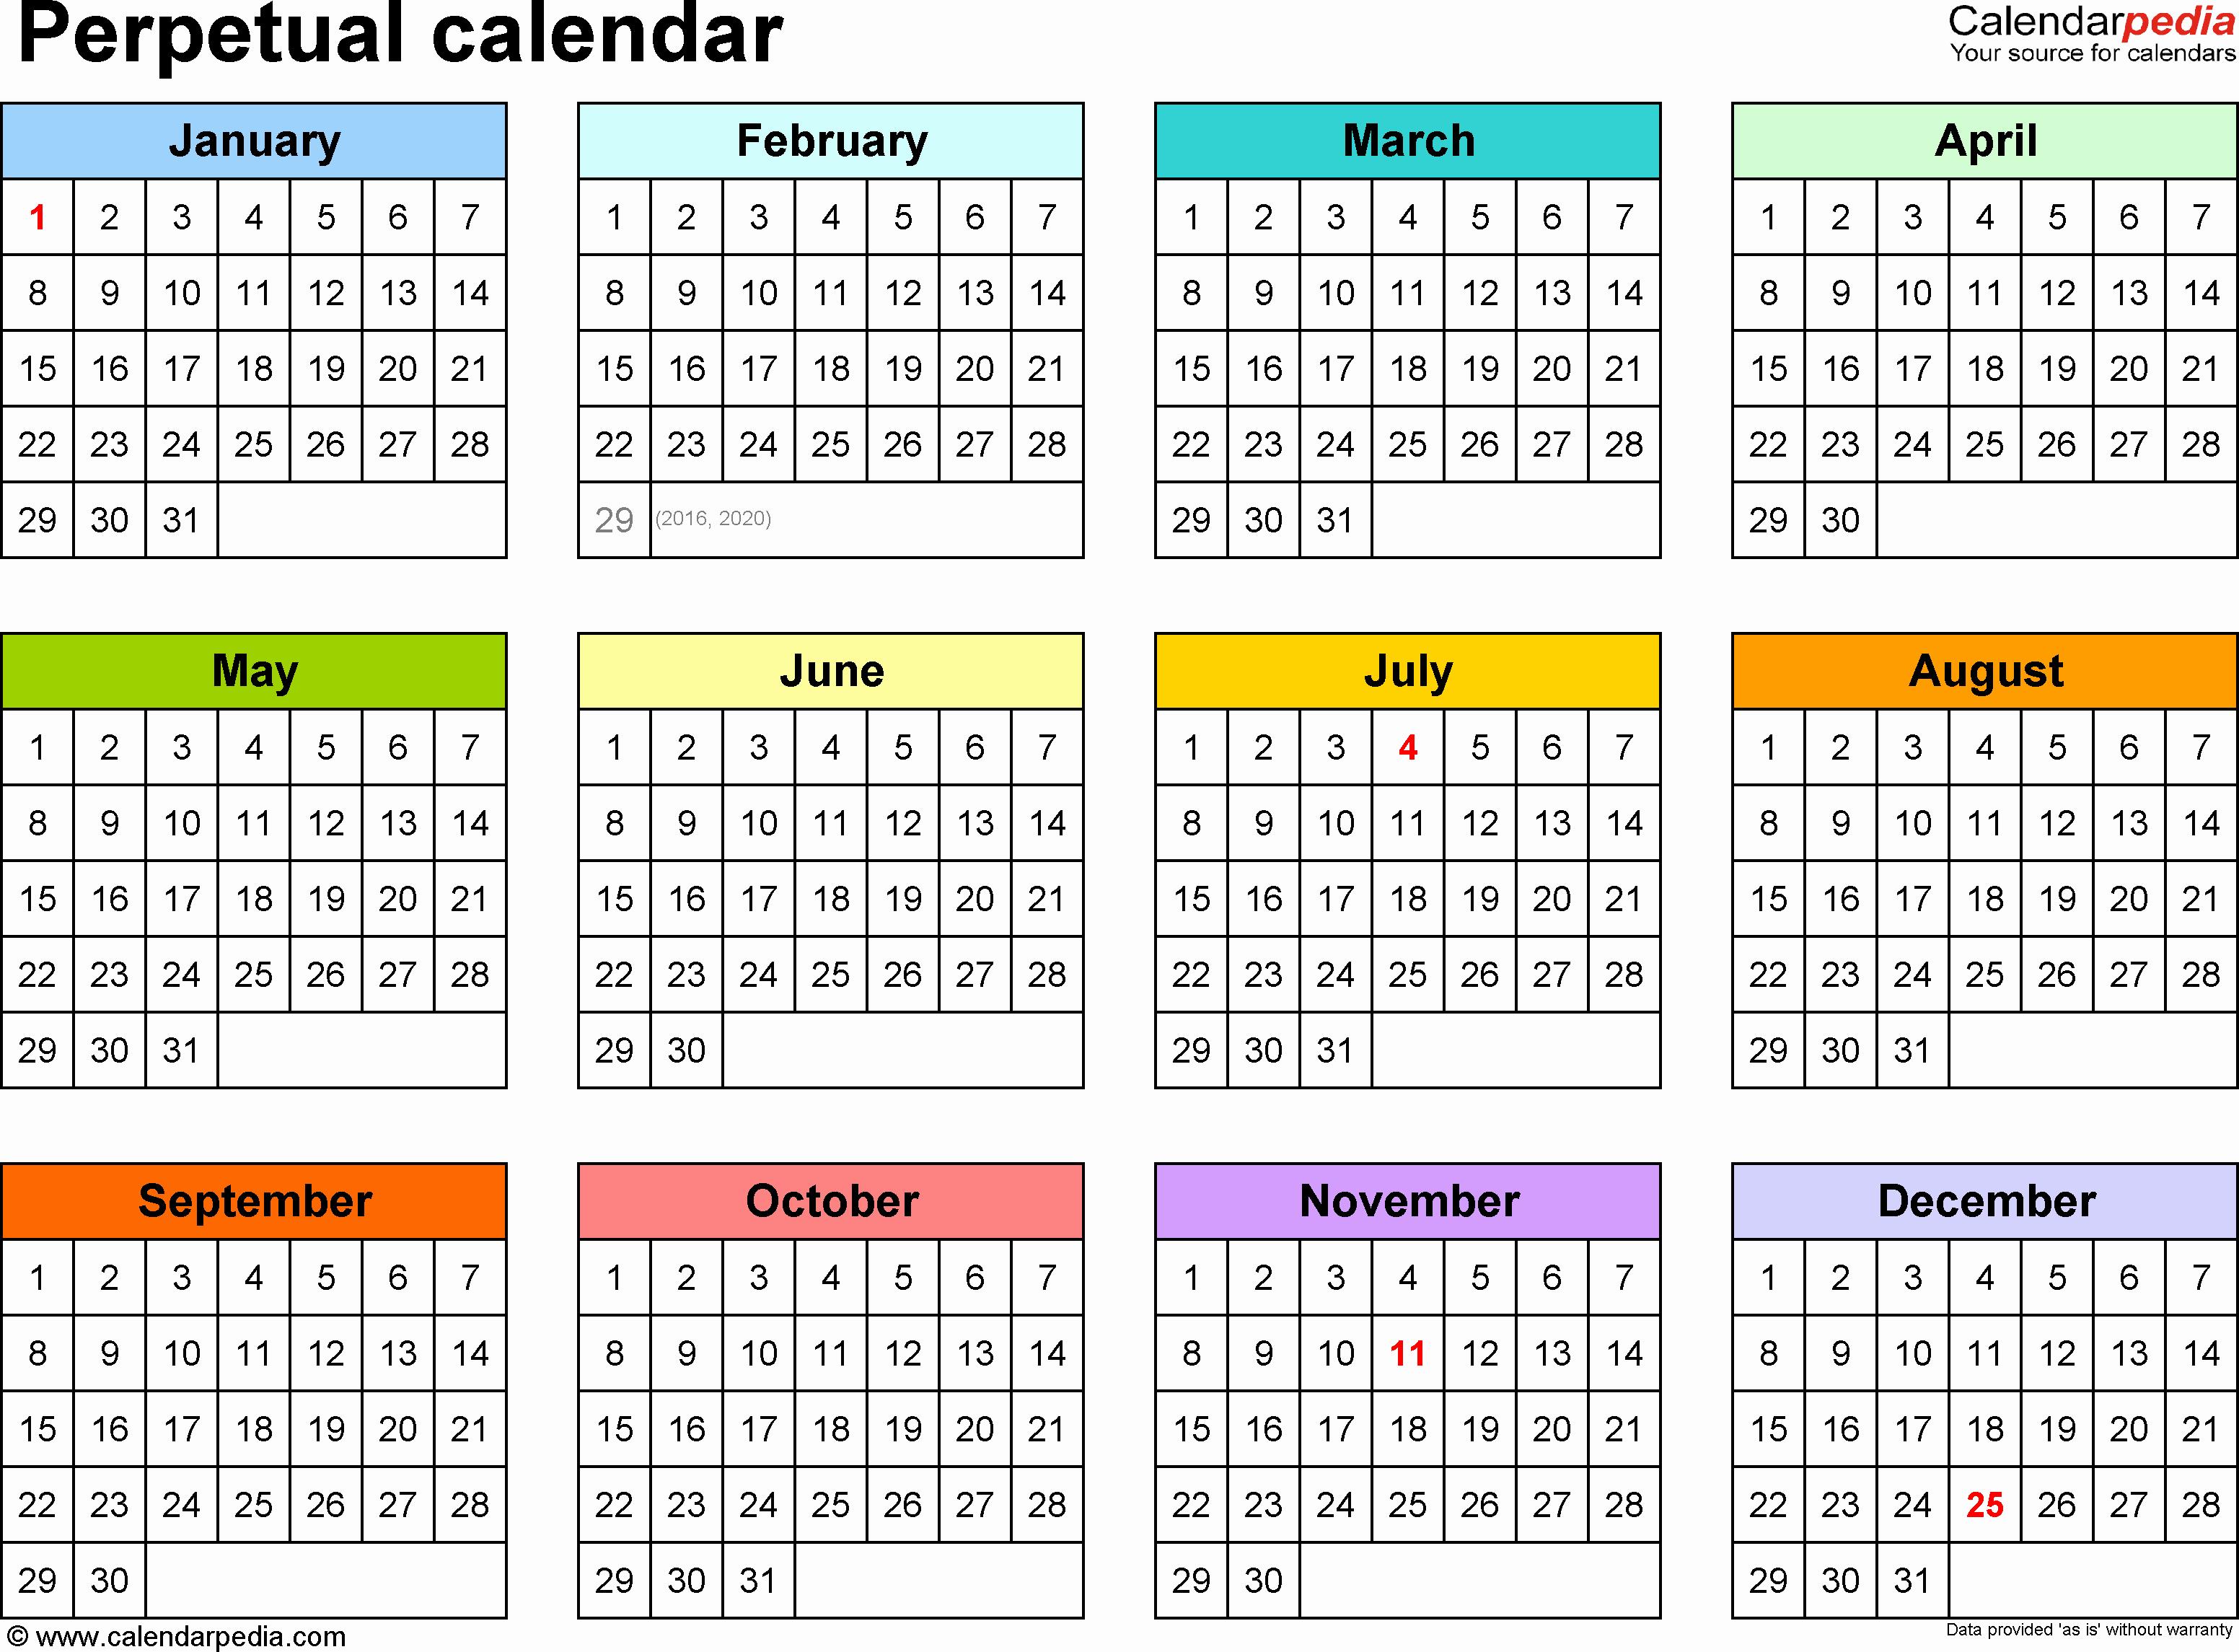 Full Year Calendar Template 2015 Lovely Perpetual Calendars 7 Free Printable Word Templates